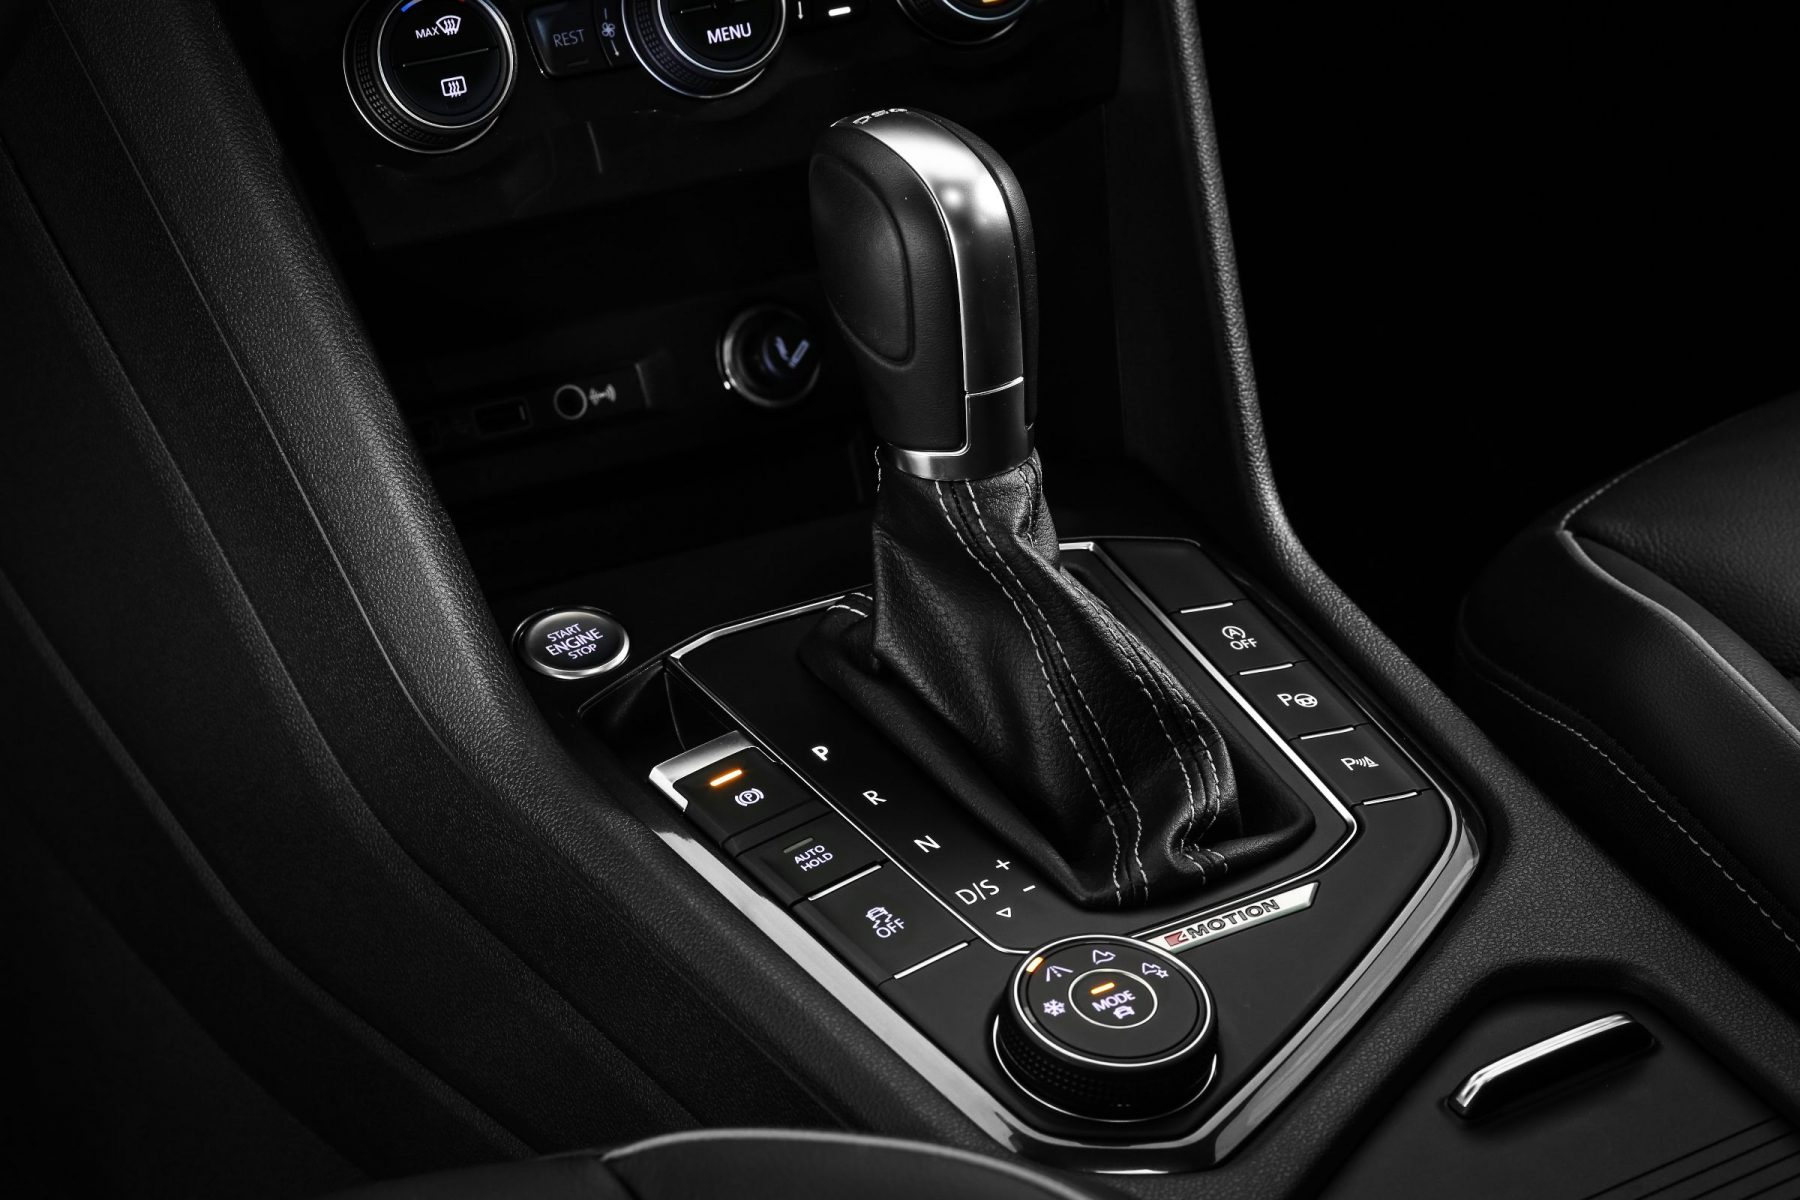 câmbio VW Tiguan Comfortline